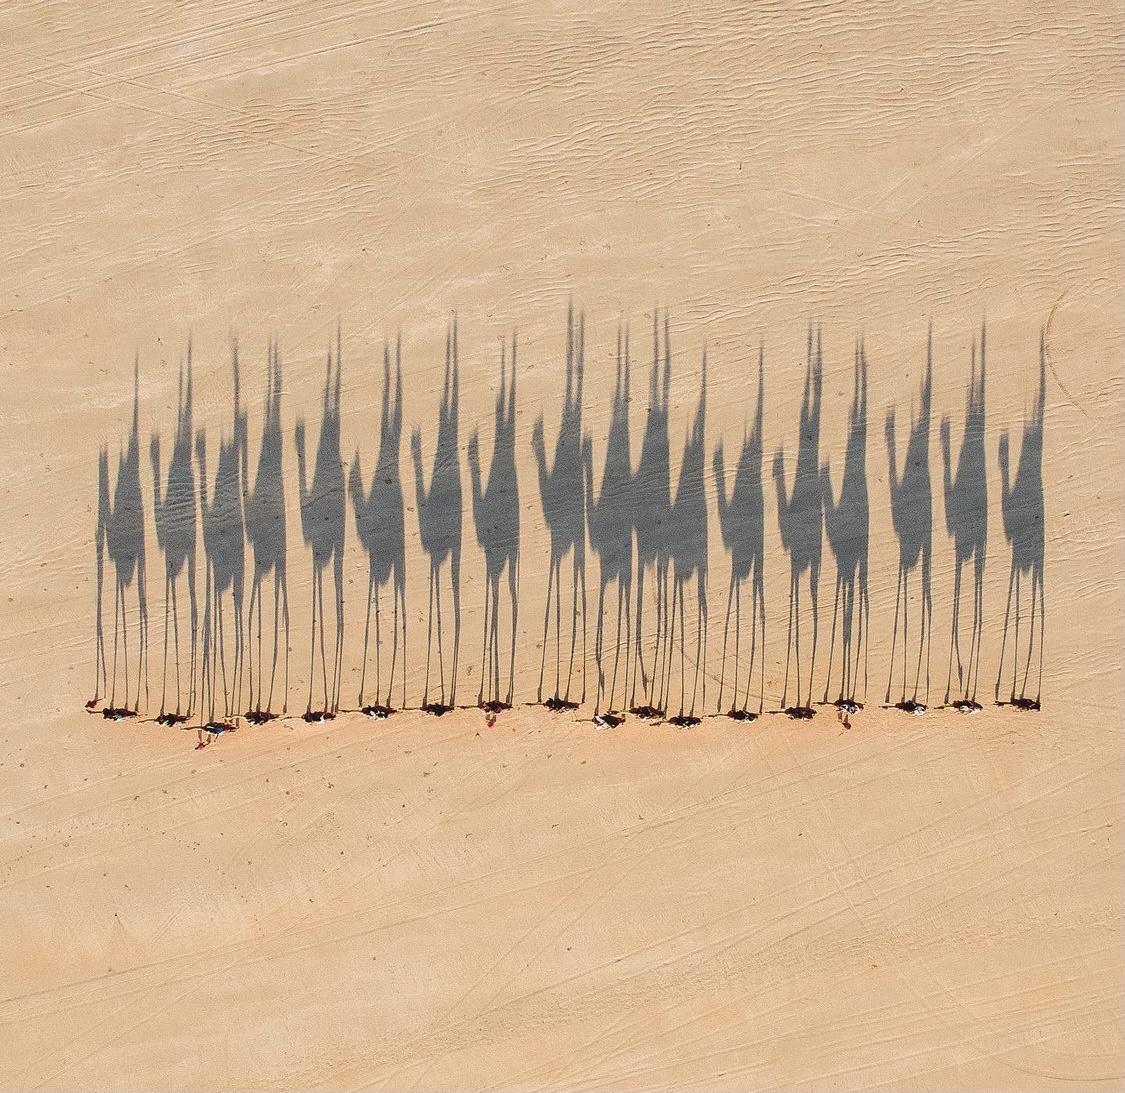 Camel shadows on sand by Jarrad Seng